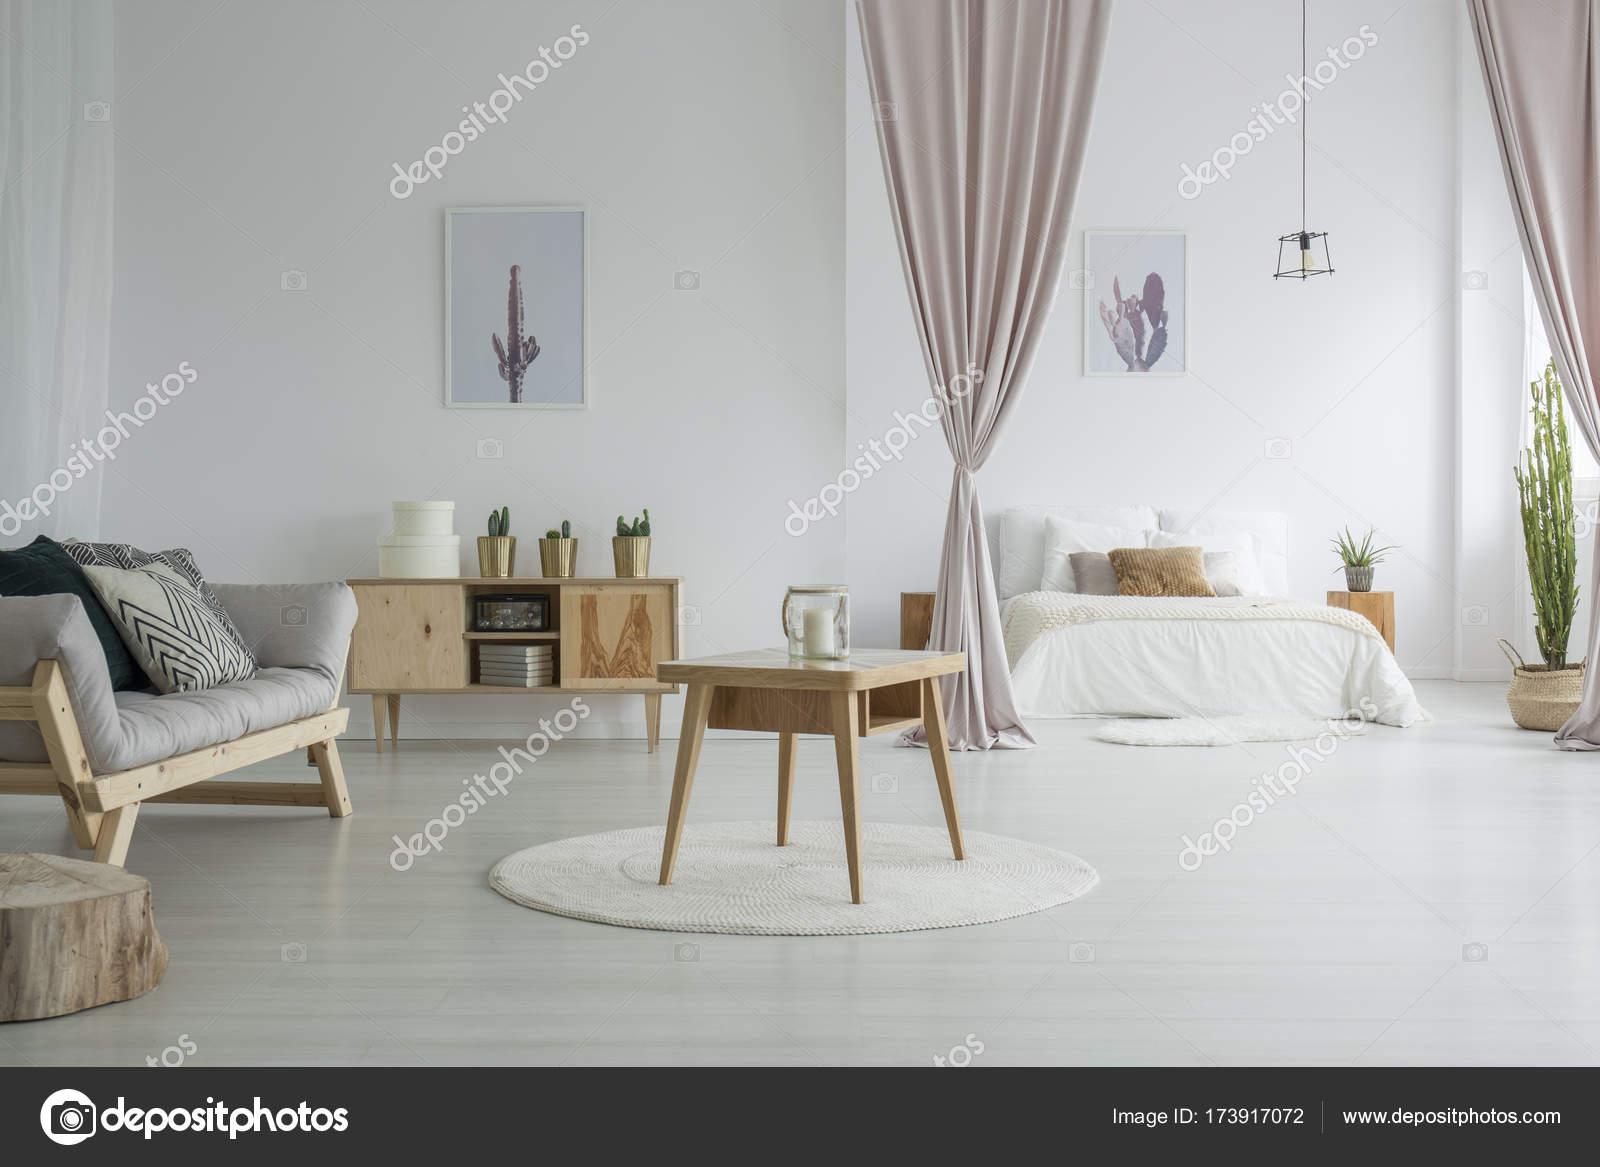 Ruime woonkamer met slaapkamer — Stockfoto © photographee.eu #173917072